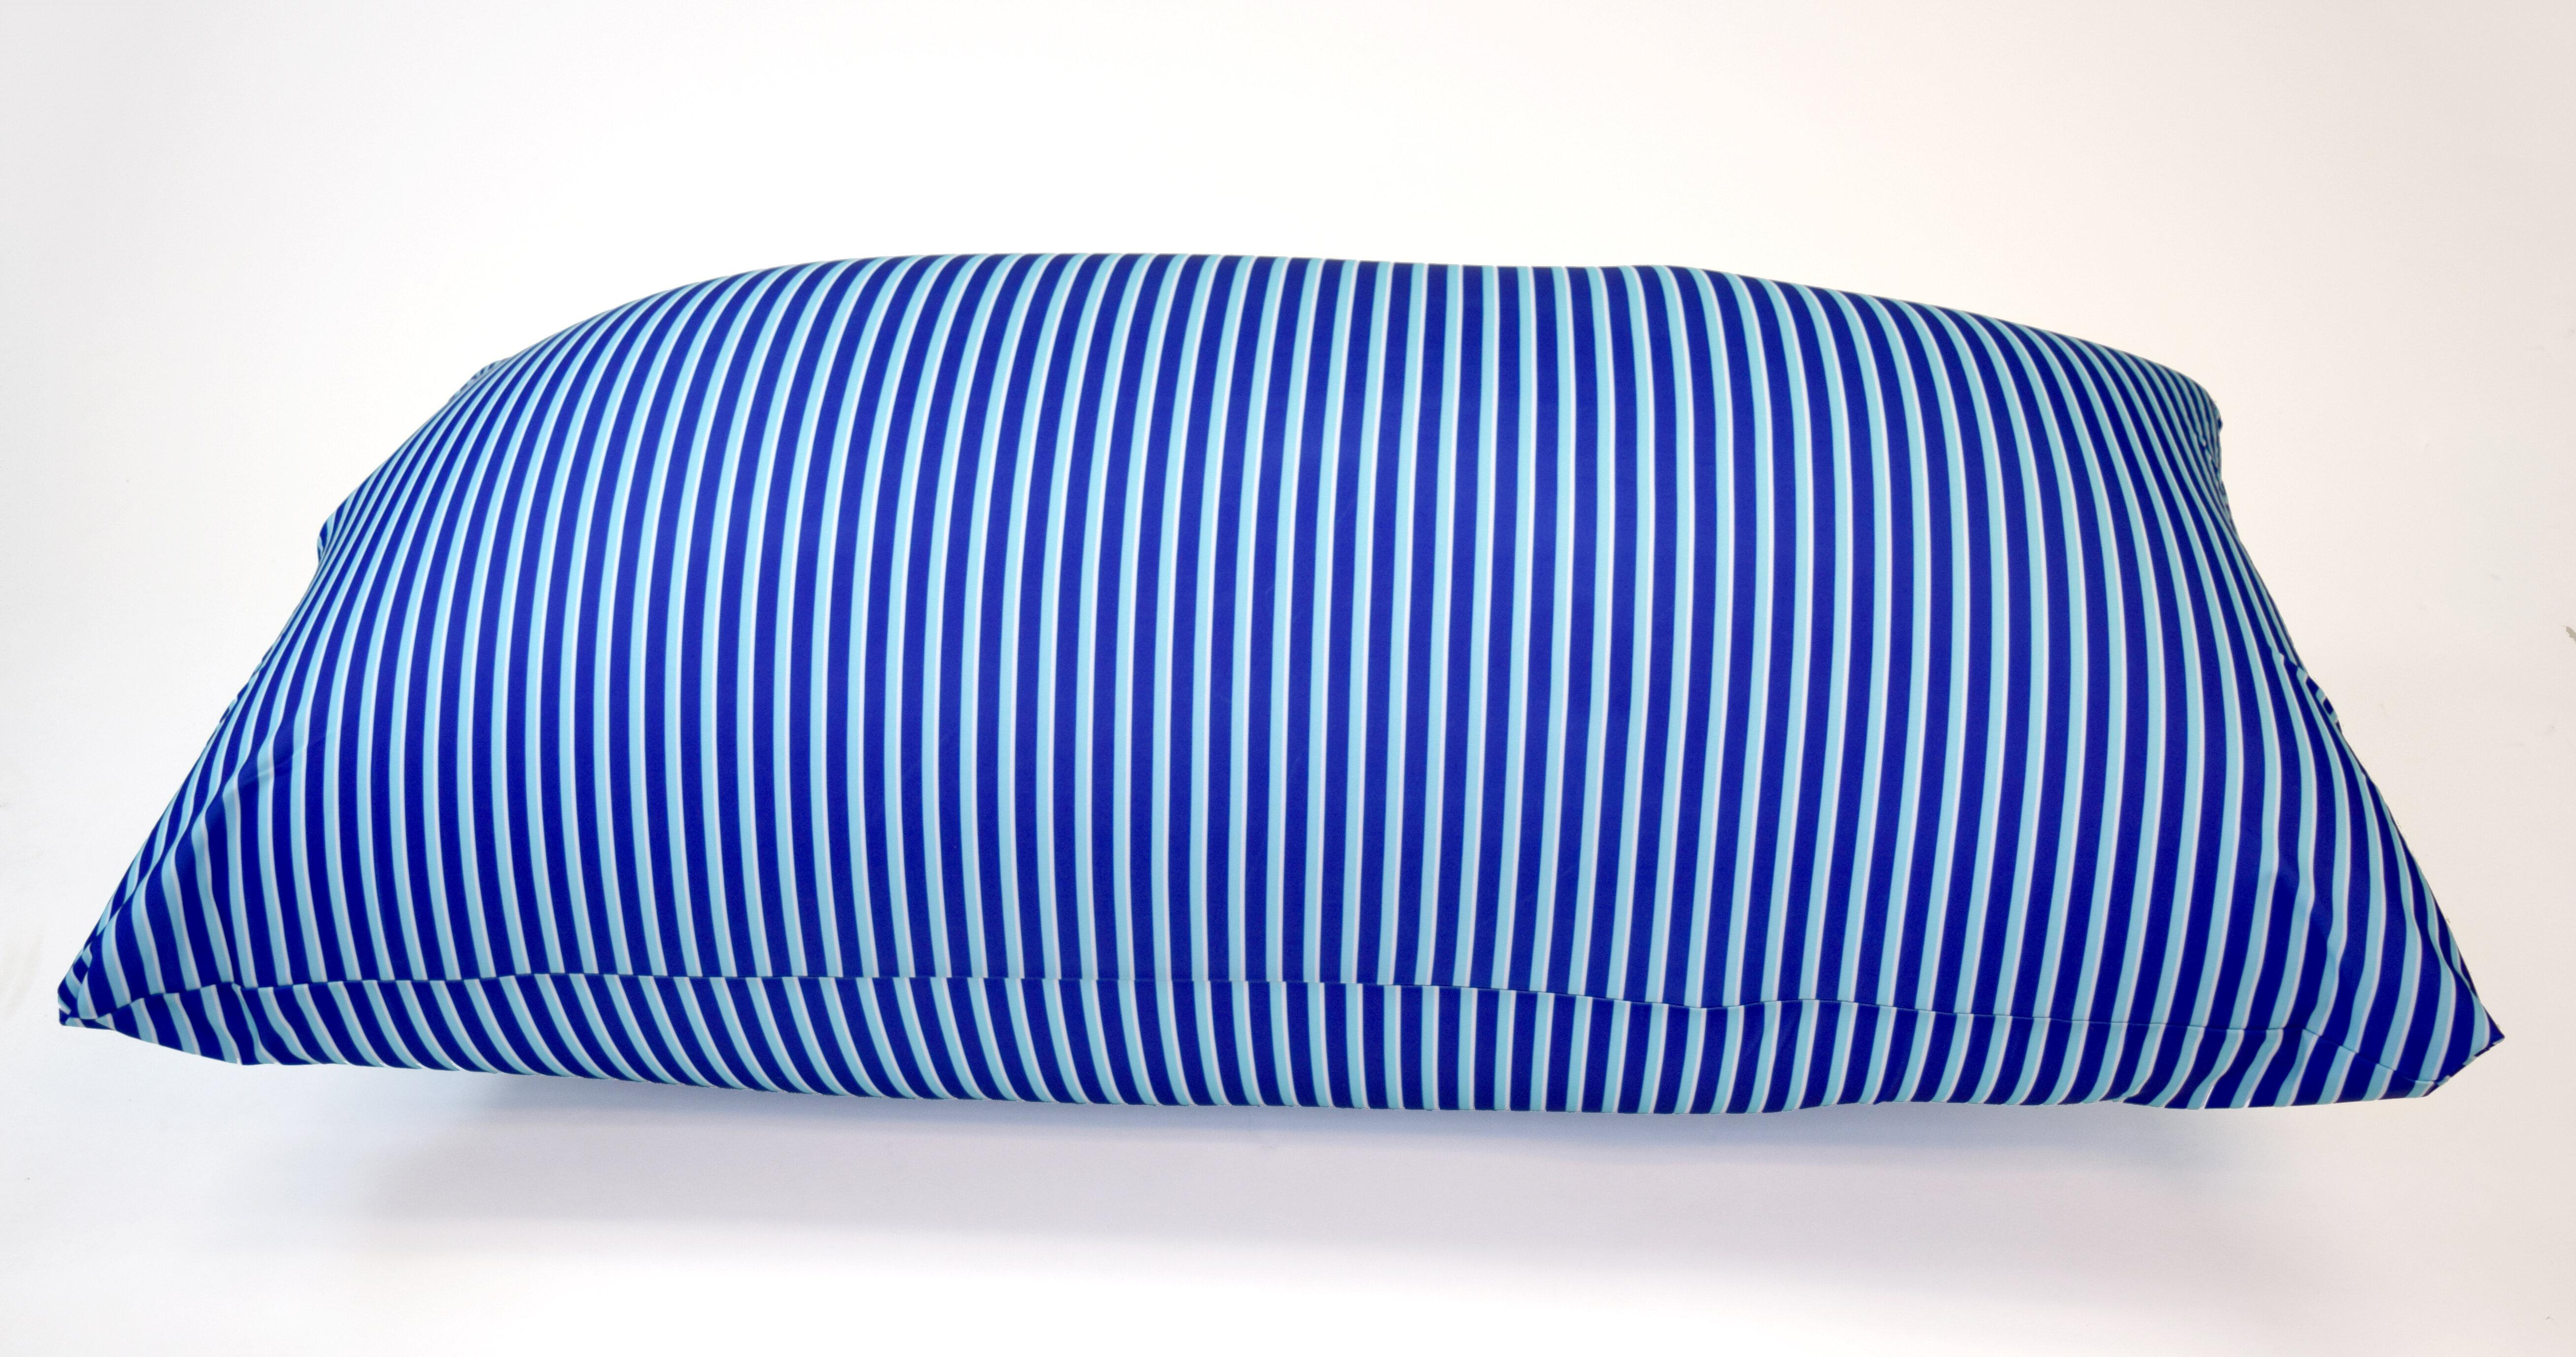 Strange Zoola Marine Bean Bag Chair Inzonedesignstudio Interior Chair Design Inzonedesignstudiocom